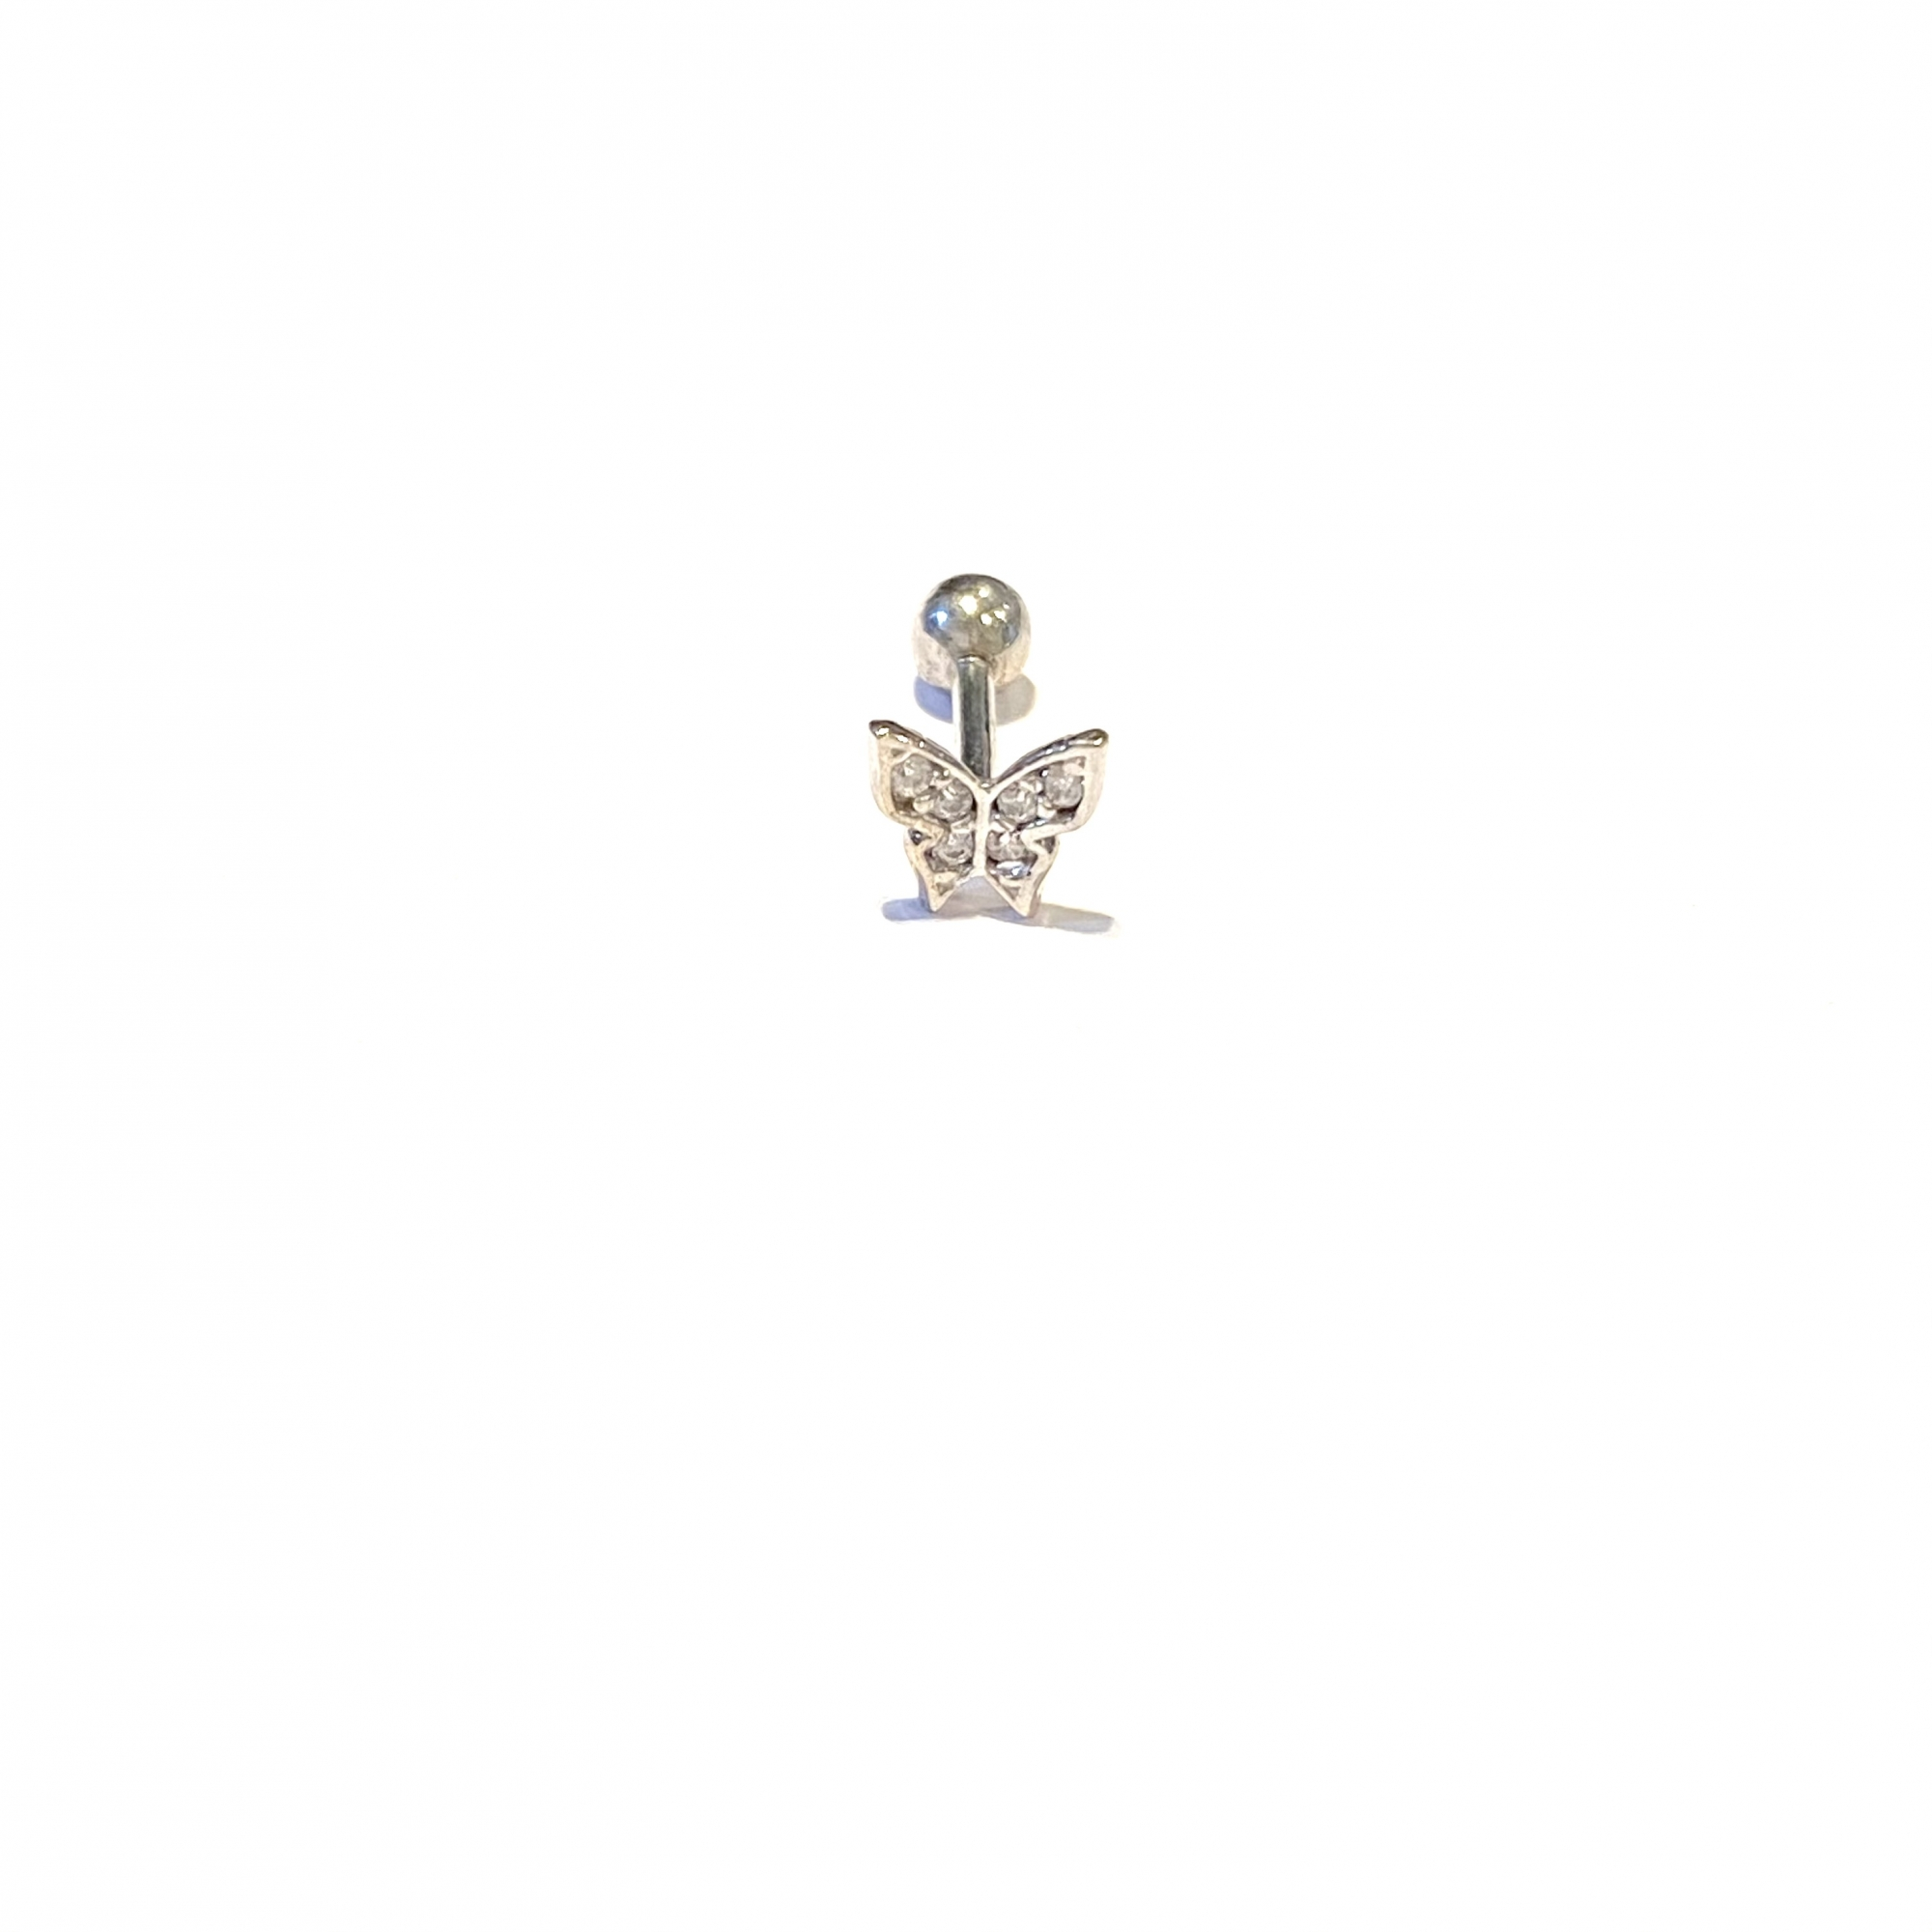 Piercing Ouro Branco 18k Borboleta Pedra  Brinco Bk070